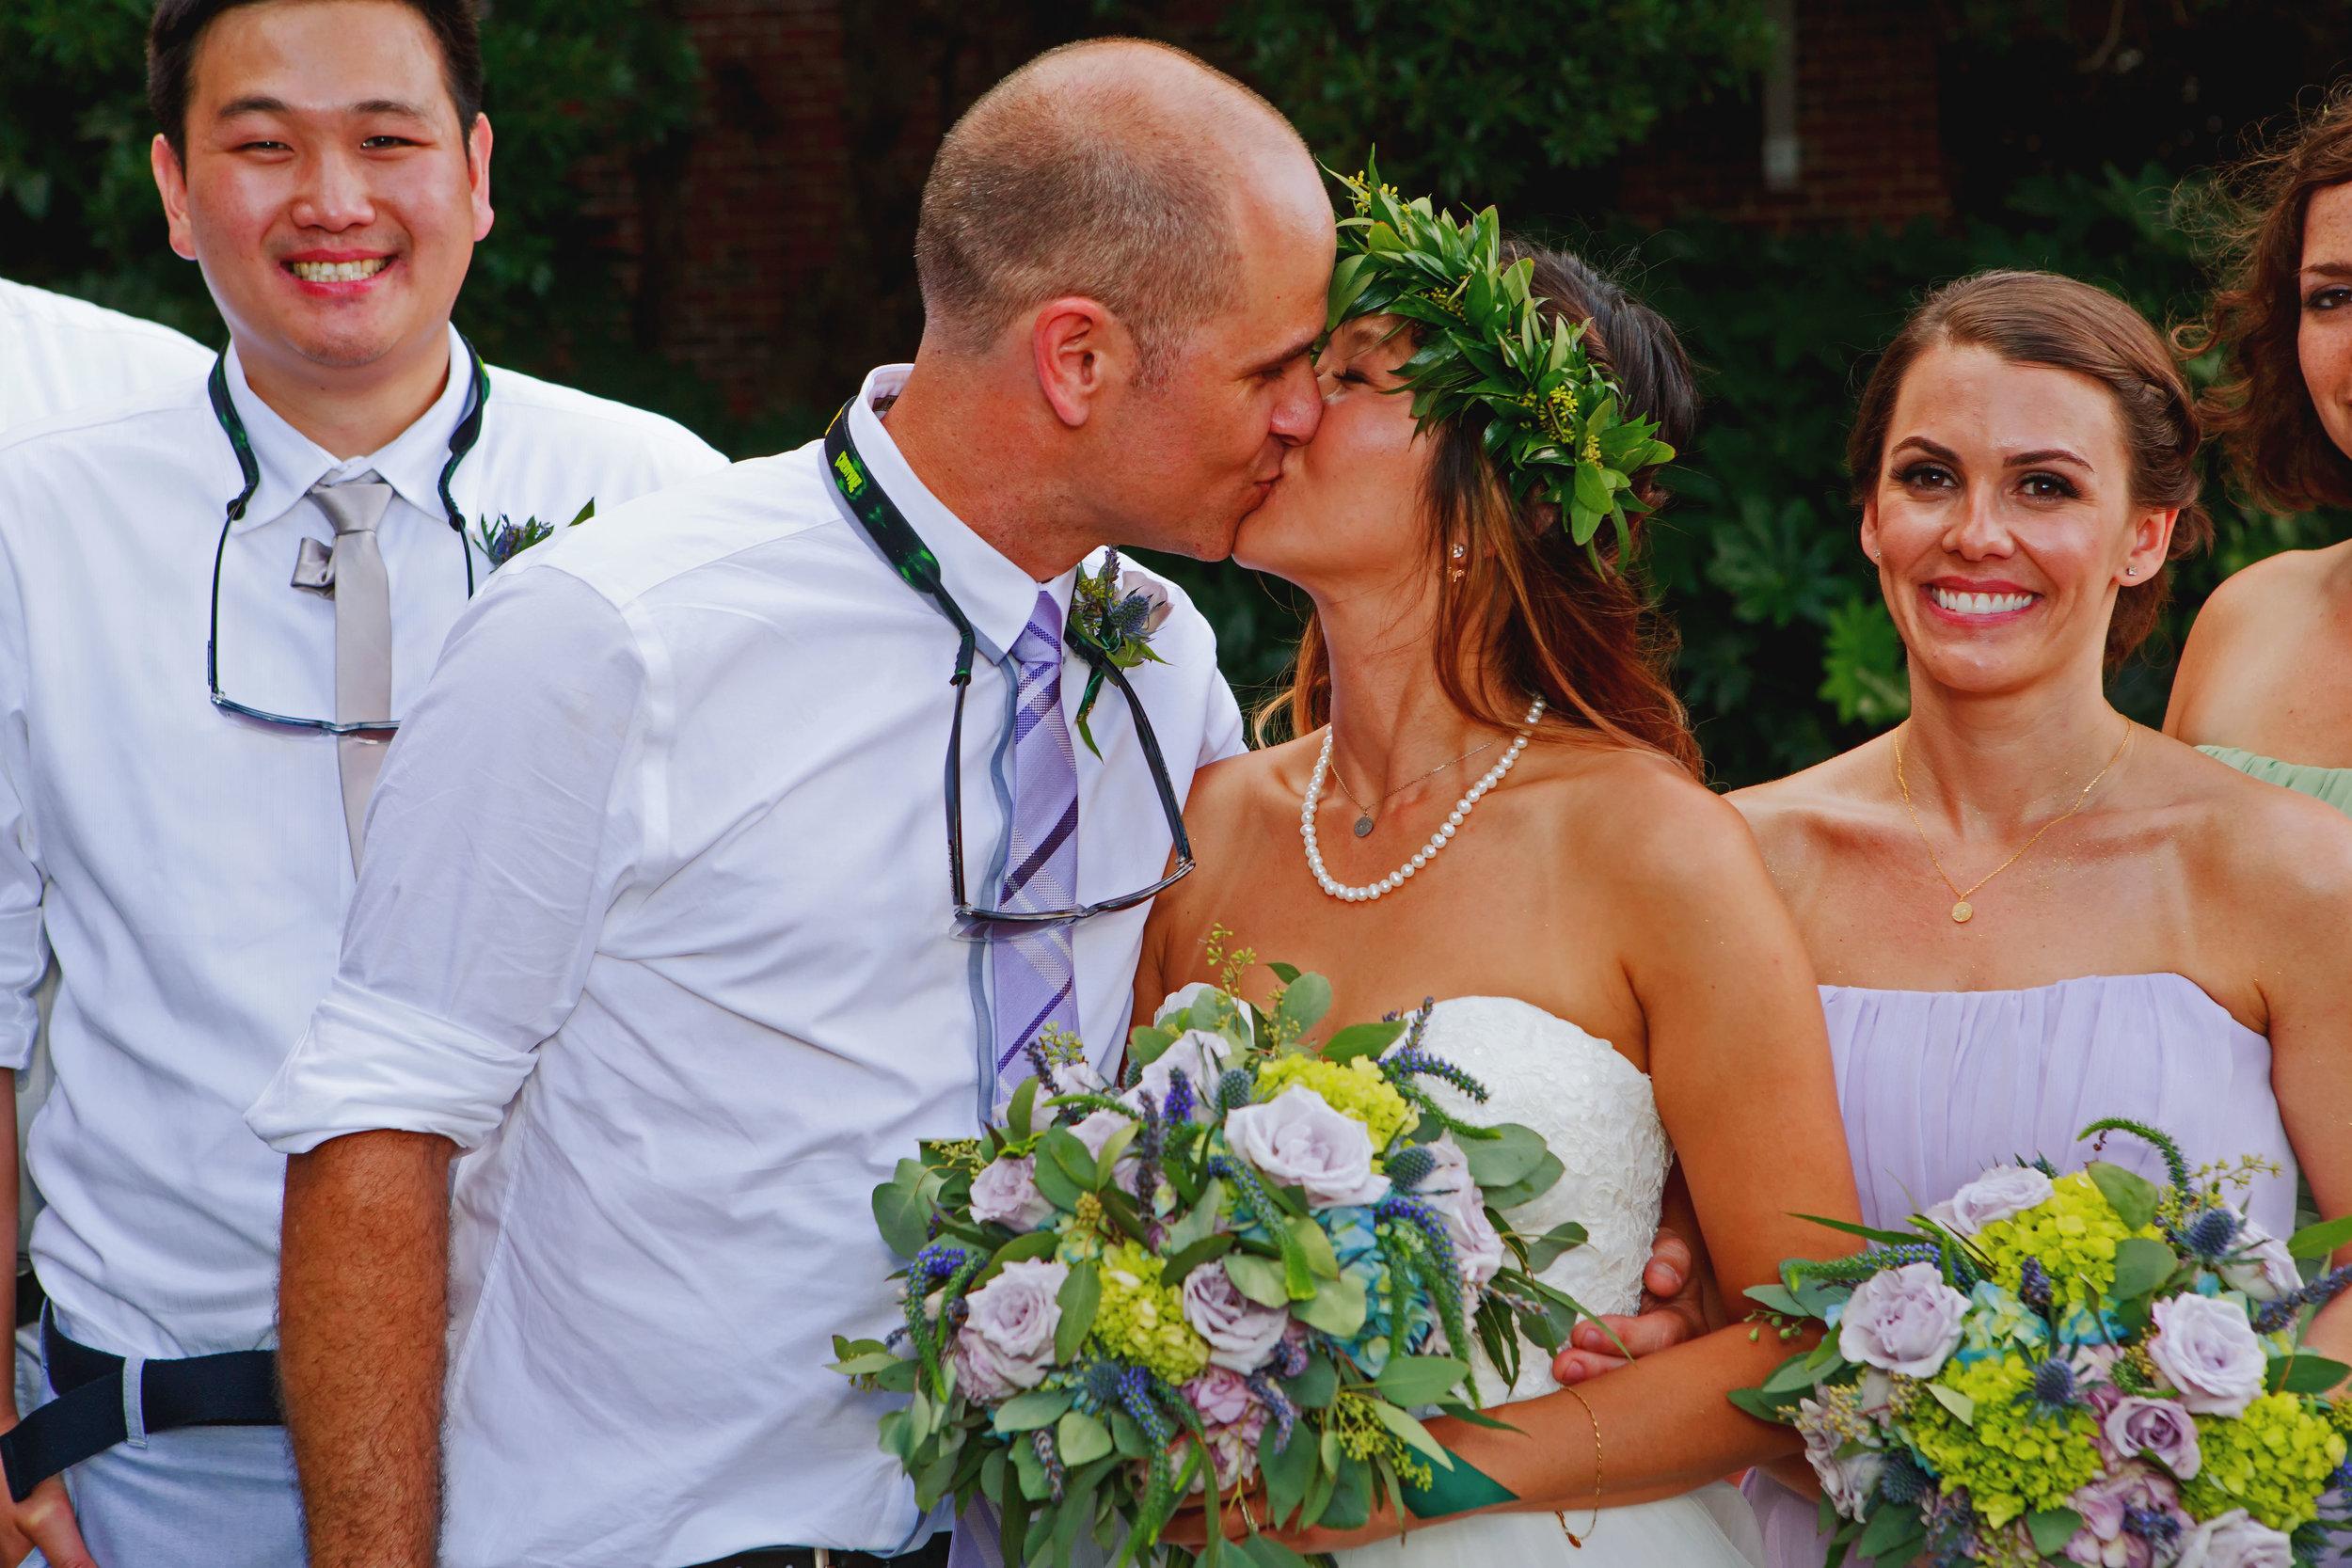 North_Carolina_Wedding_Photographer_Tiffany_Abruzzo_Group_31.jpg